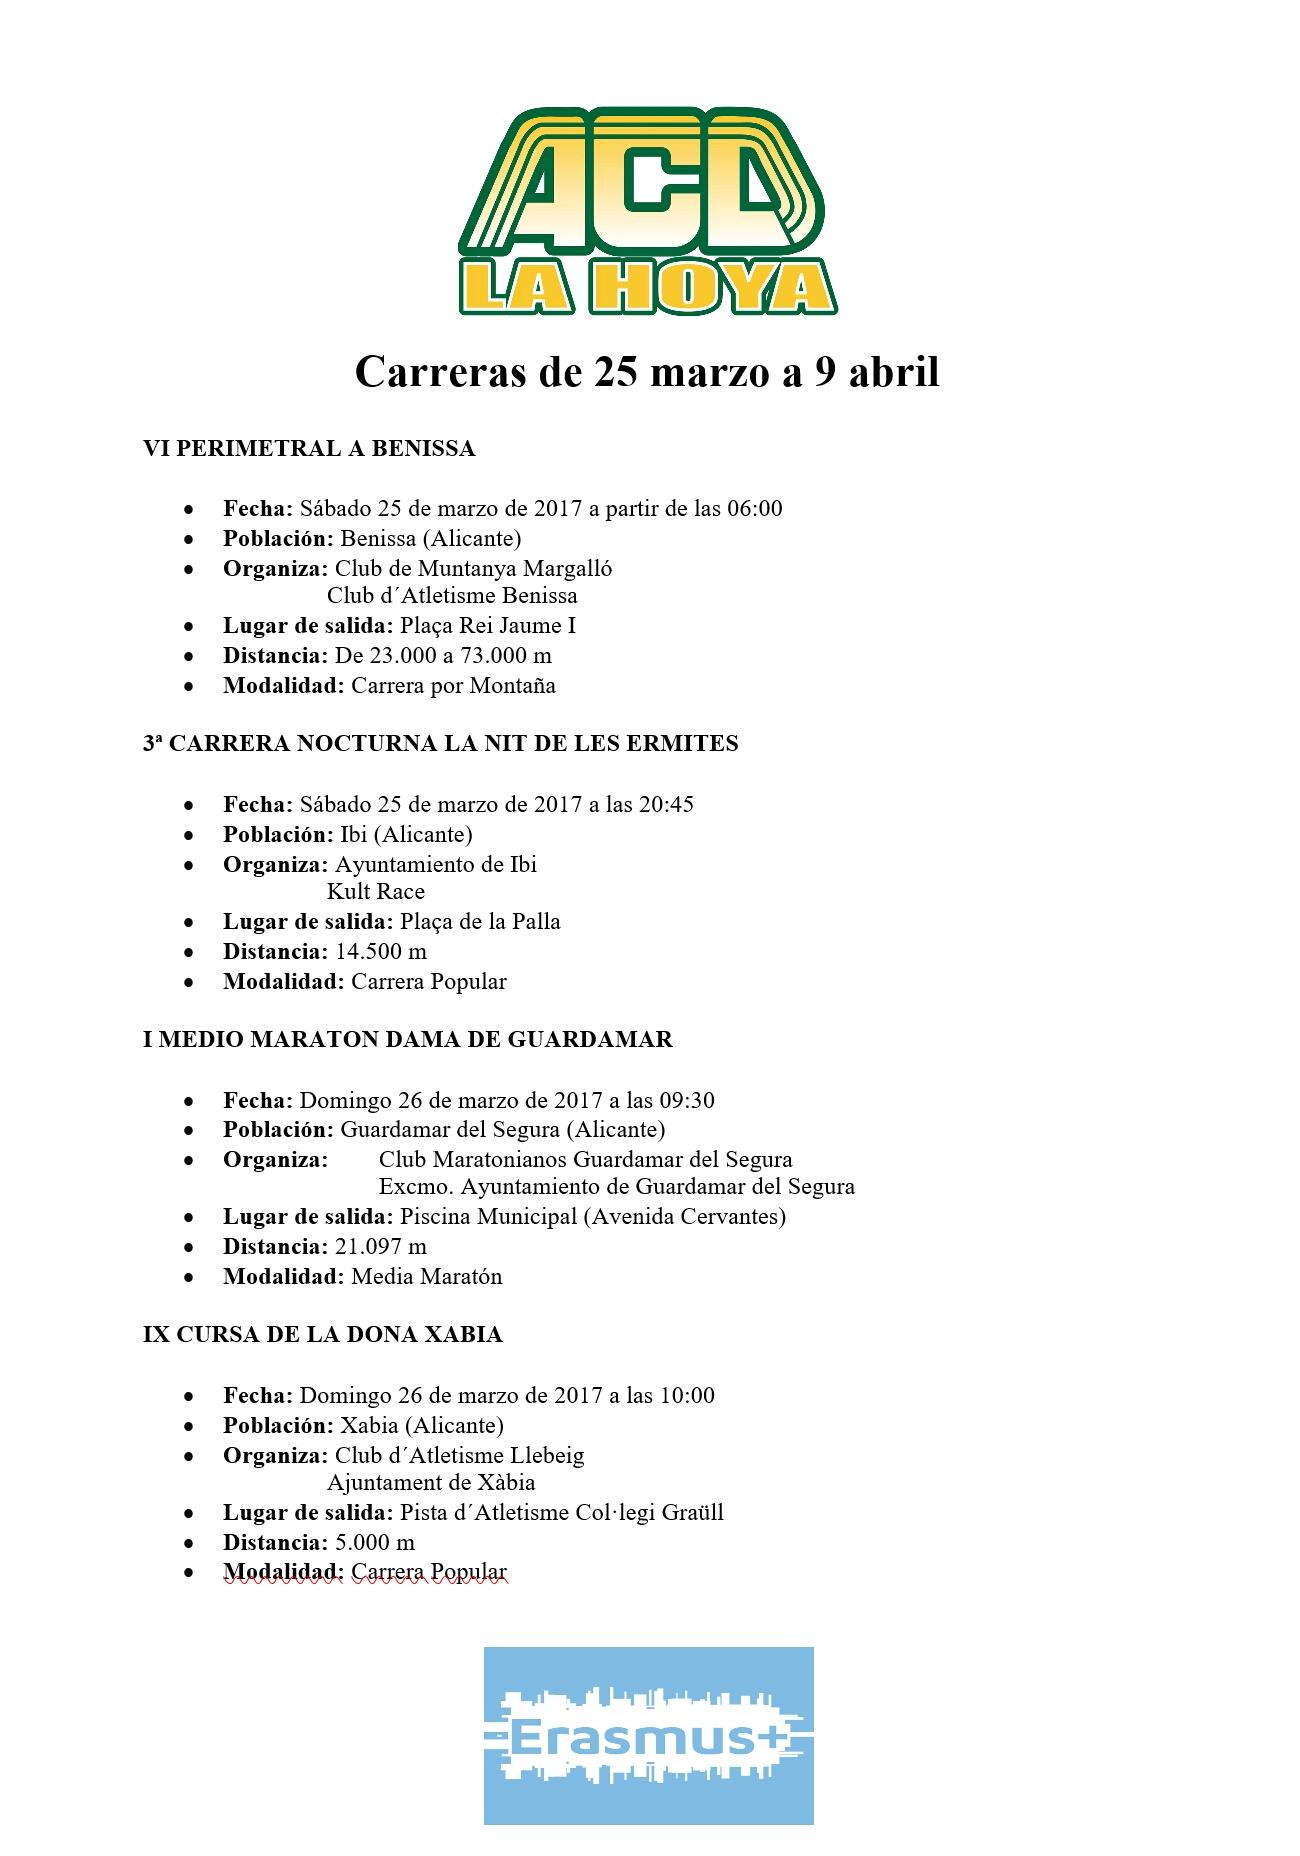 Carreras de 25 – 9 abril (2)